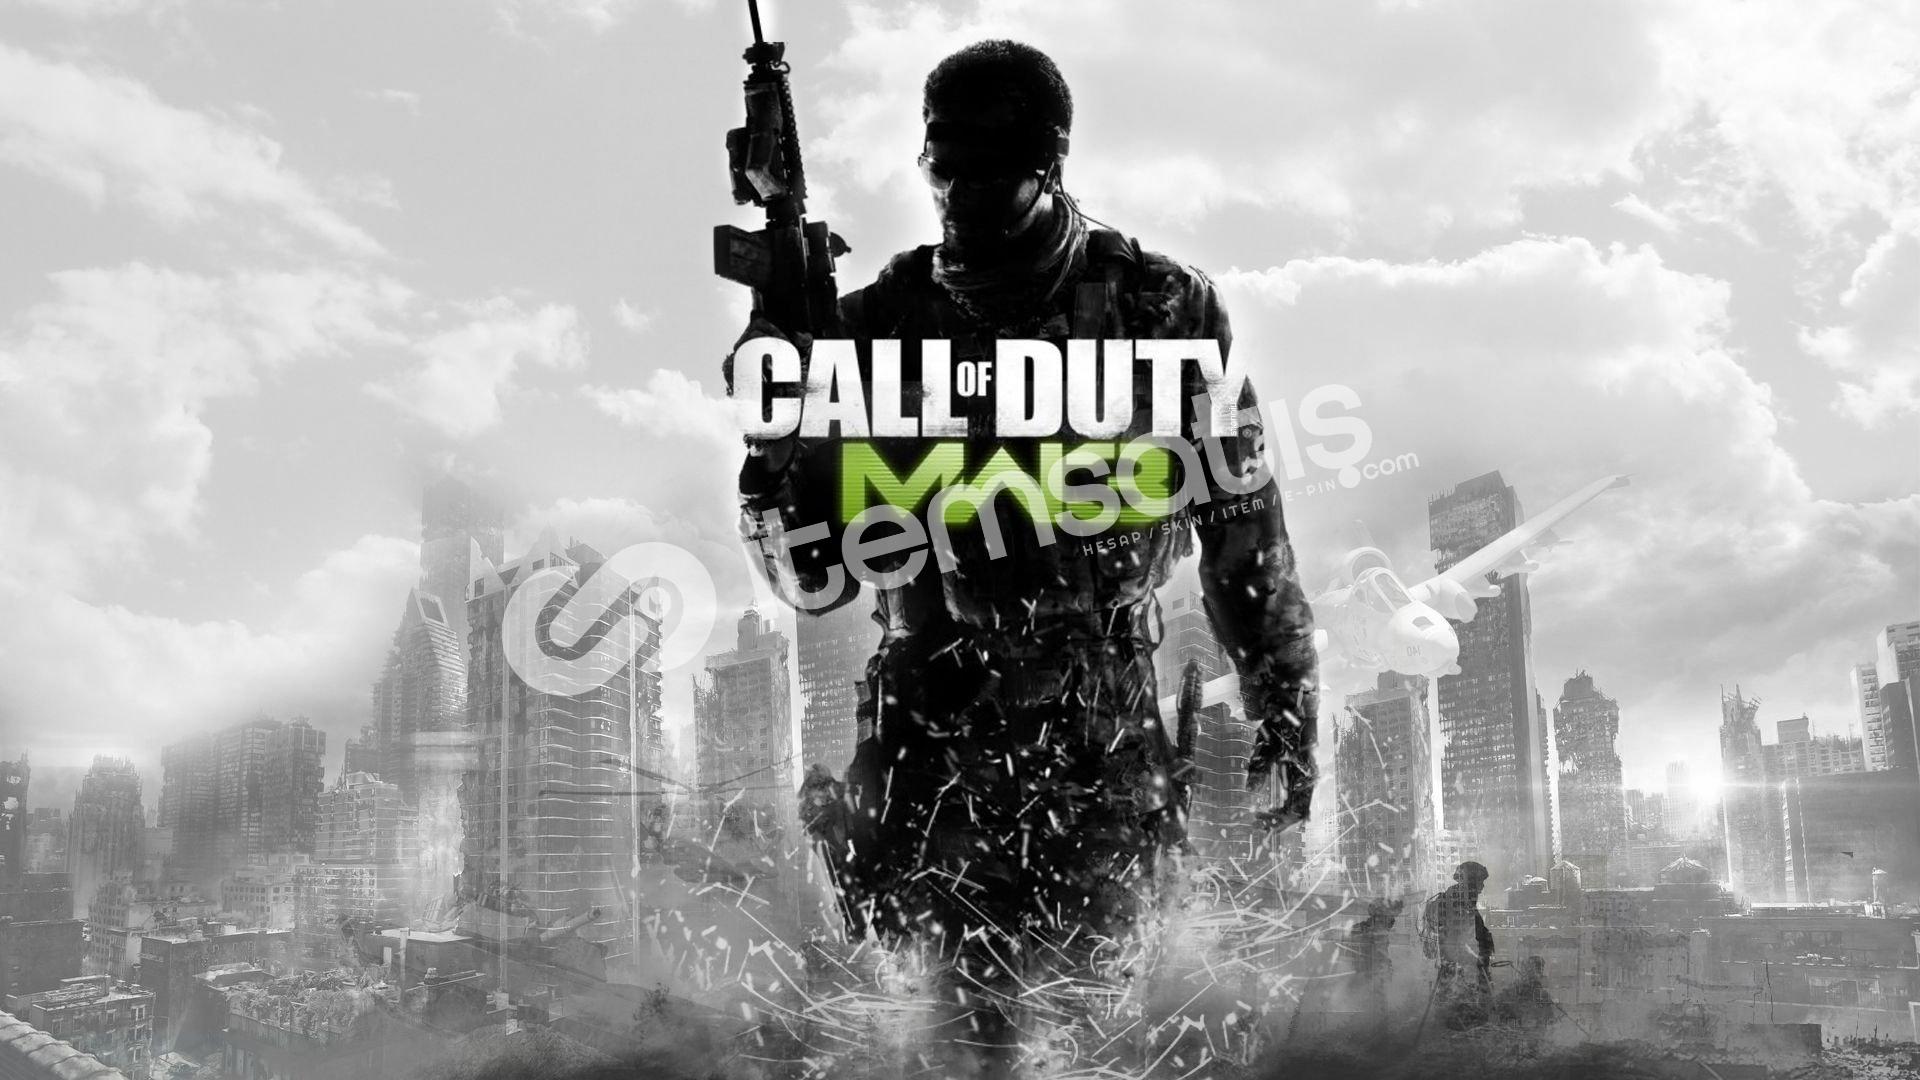 Call of Duty Modern Warfare 3 (9.99TL)